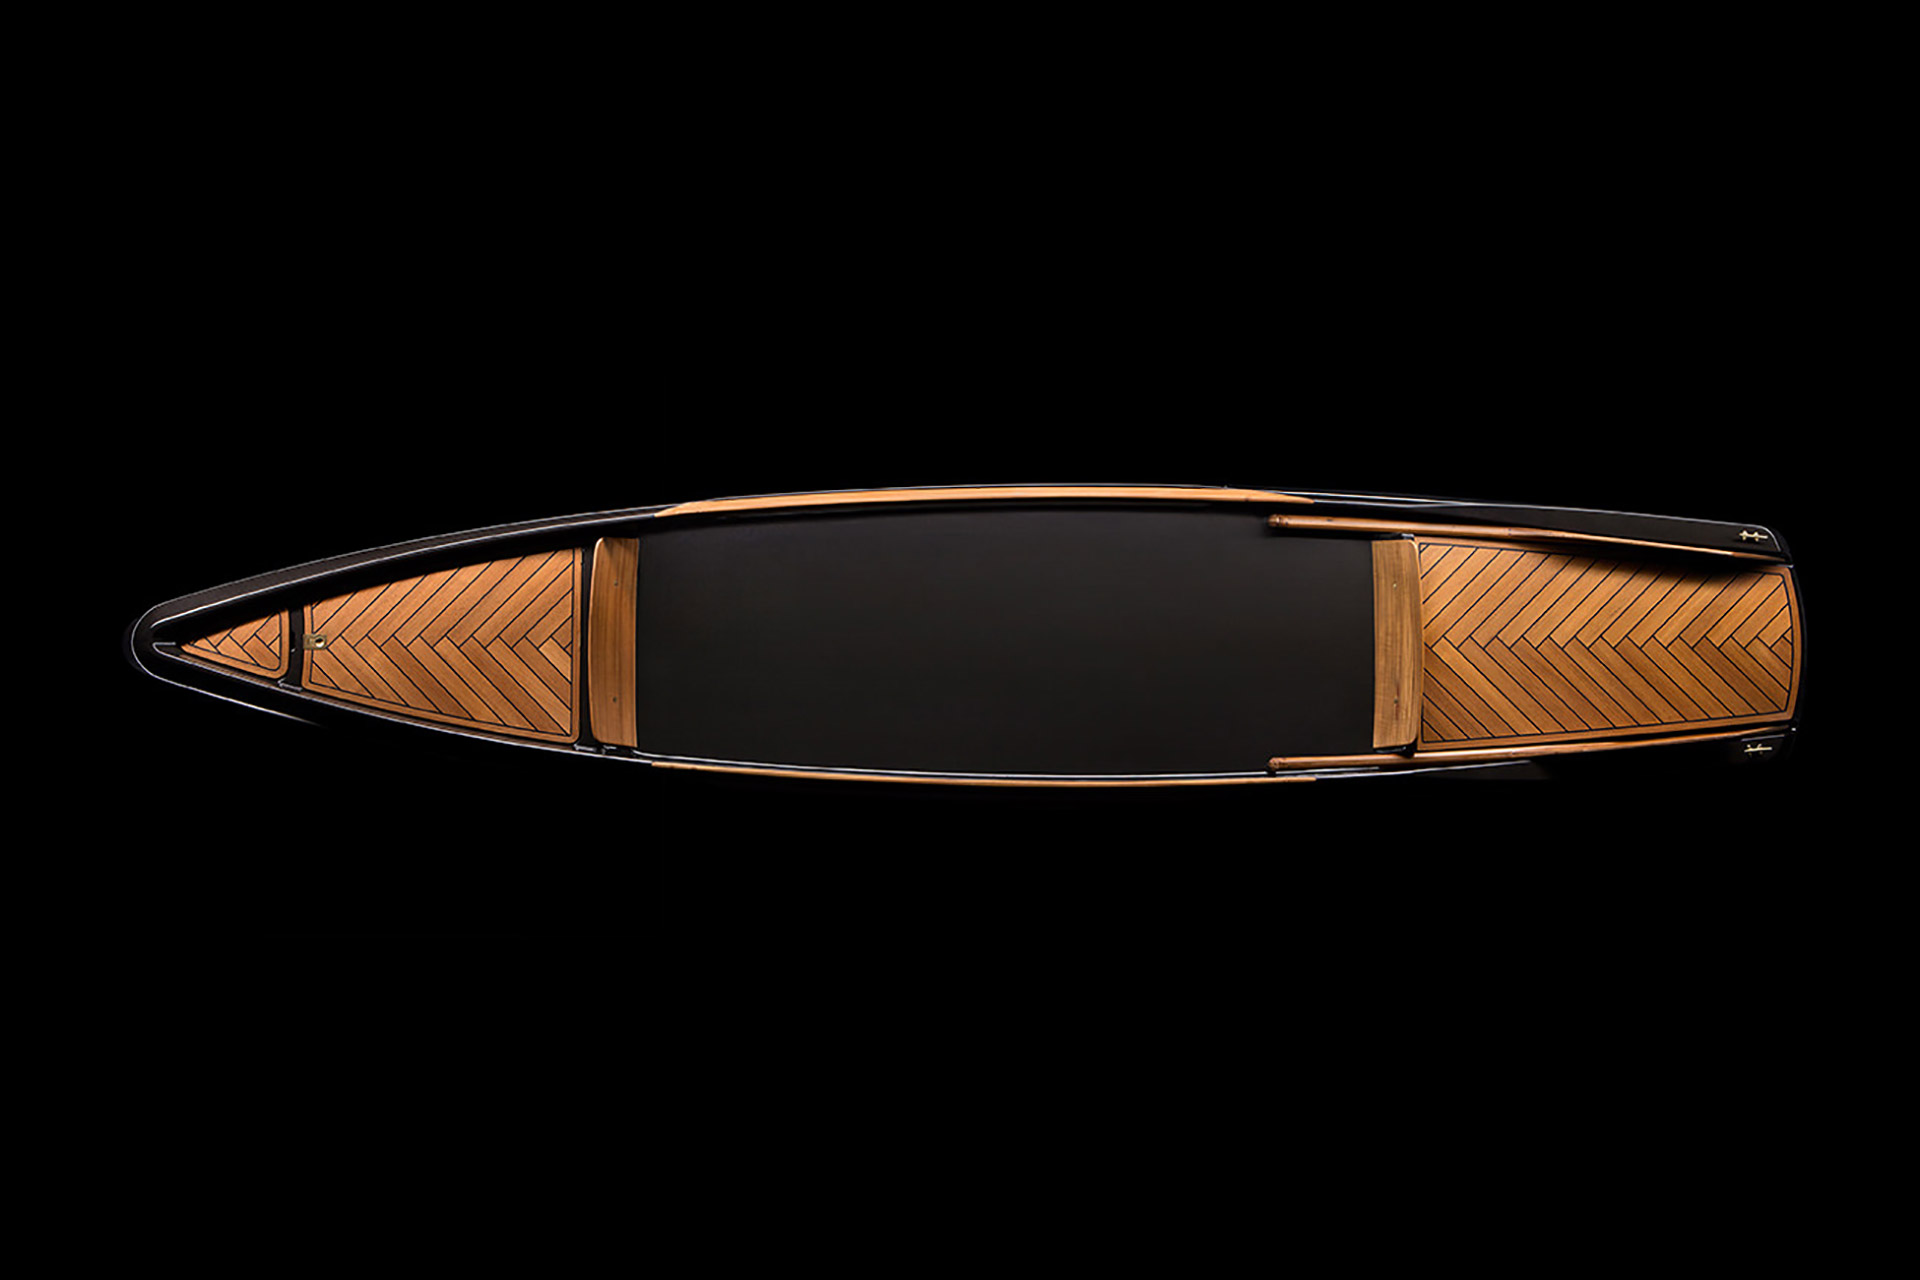 BorromeodeSilva Monocoque Paddle Canoe